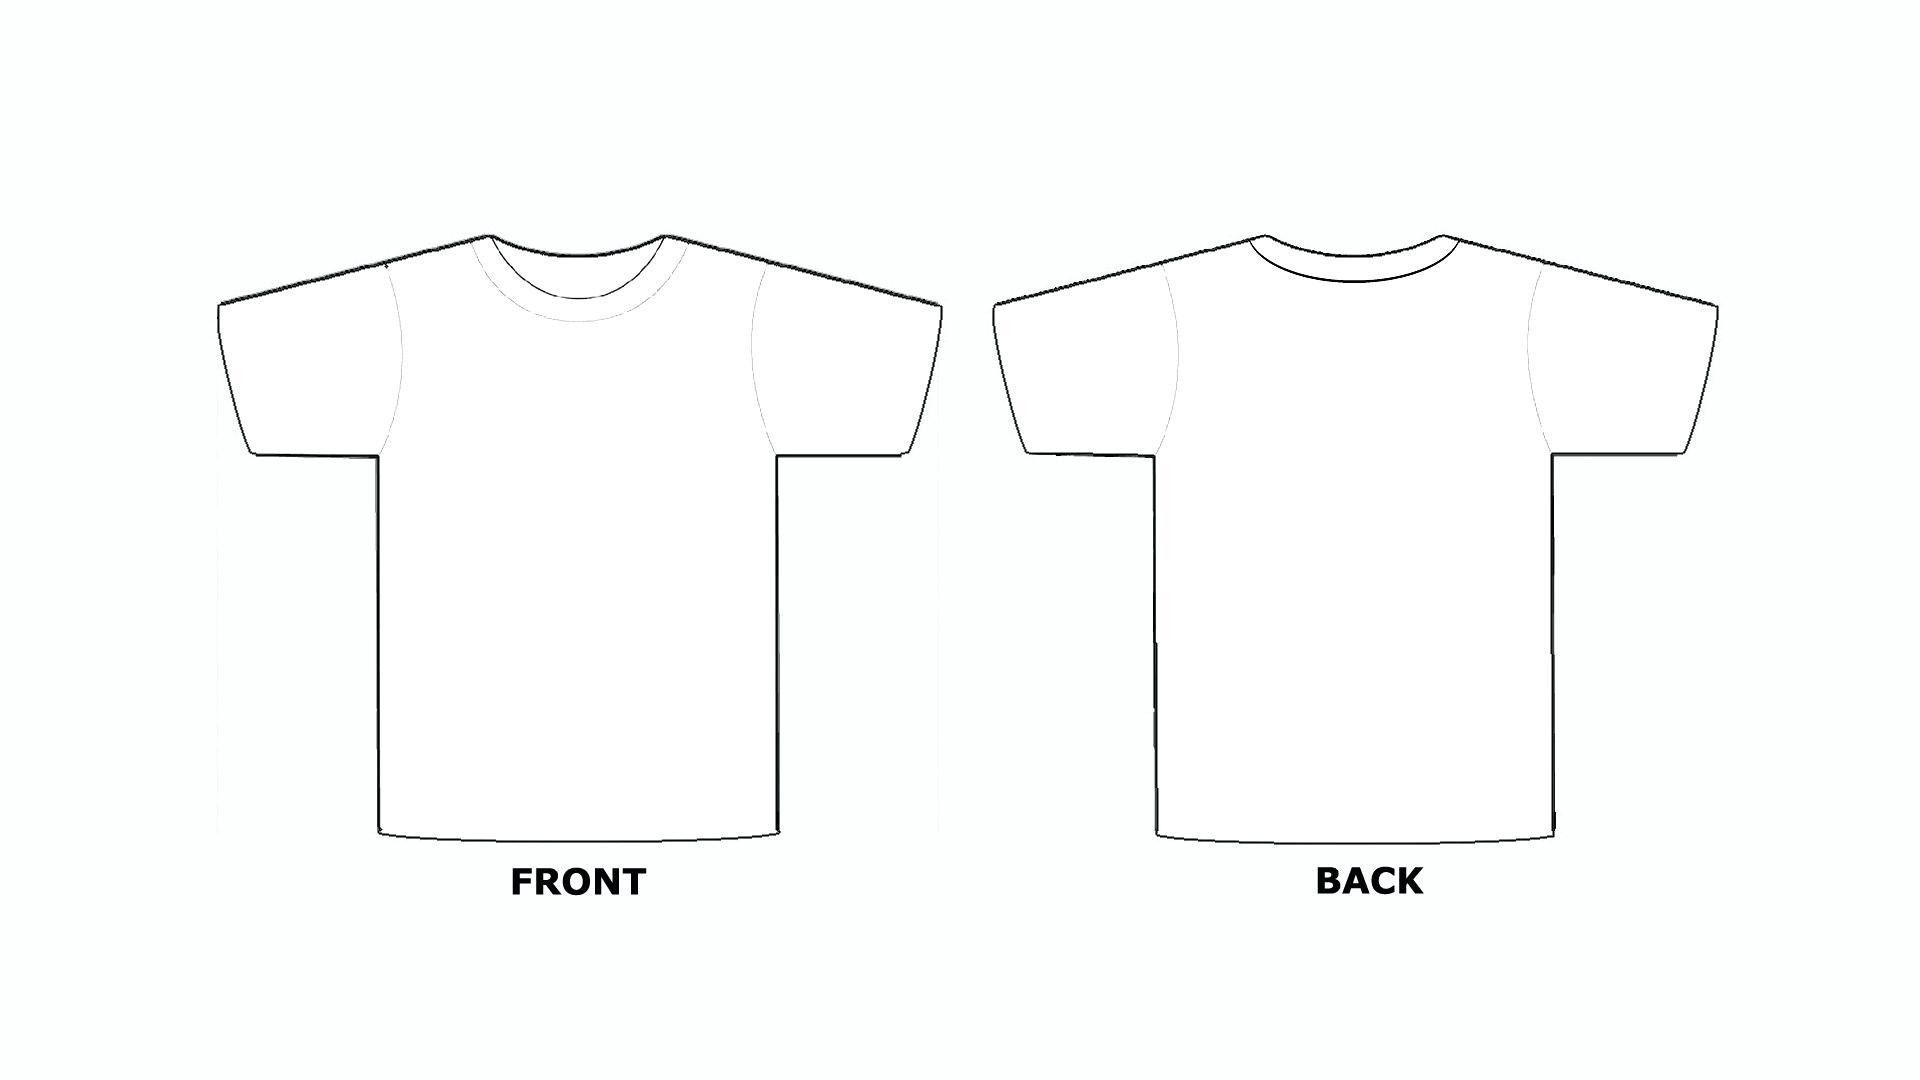 Printable Blank Tshirt Template C Punkt In Printable Blank Tshirt Template Best Sample Template T Shirt Design Template Shirt Template Tshirt Template